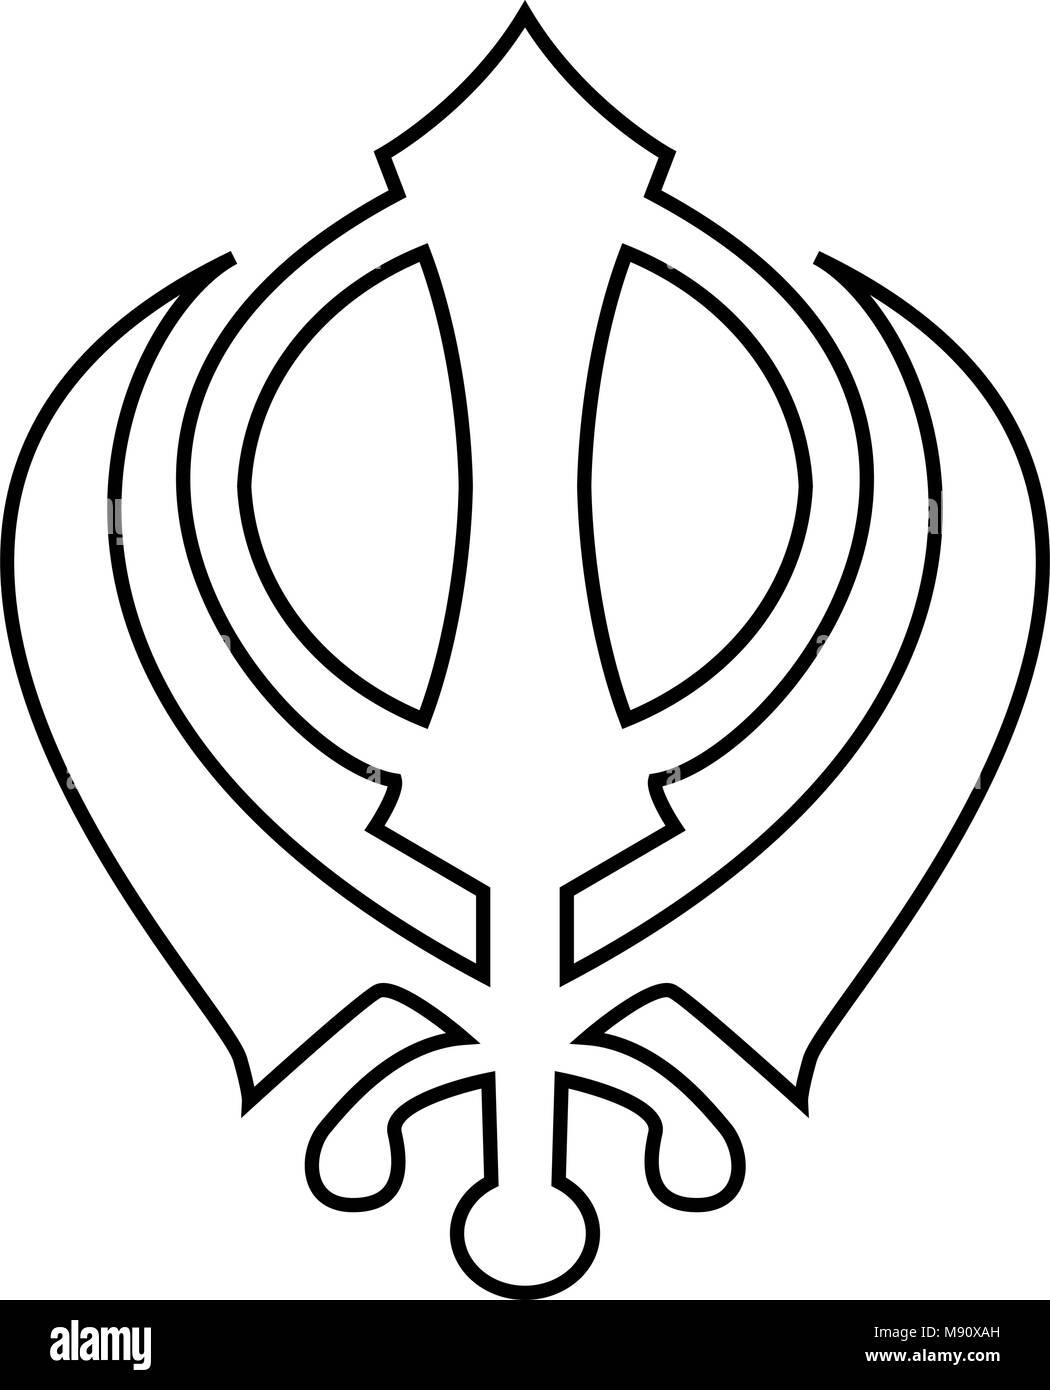 Sikh Khanda Emblem Stock Photos Sikh Khanda Emblem Stock Images